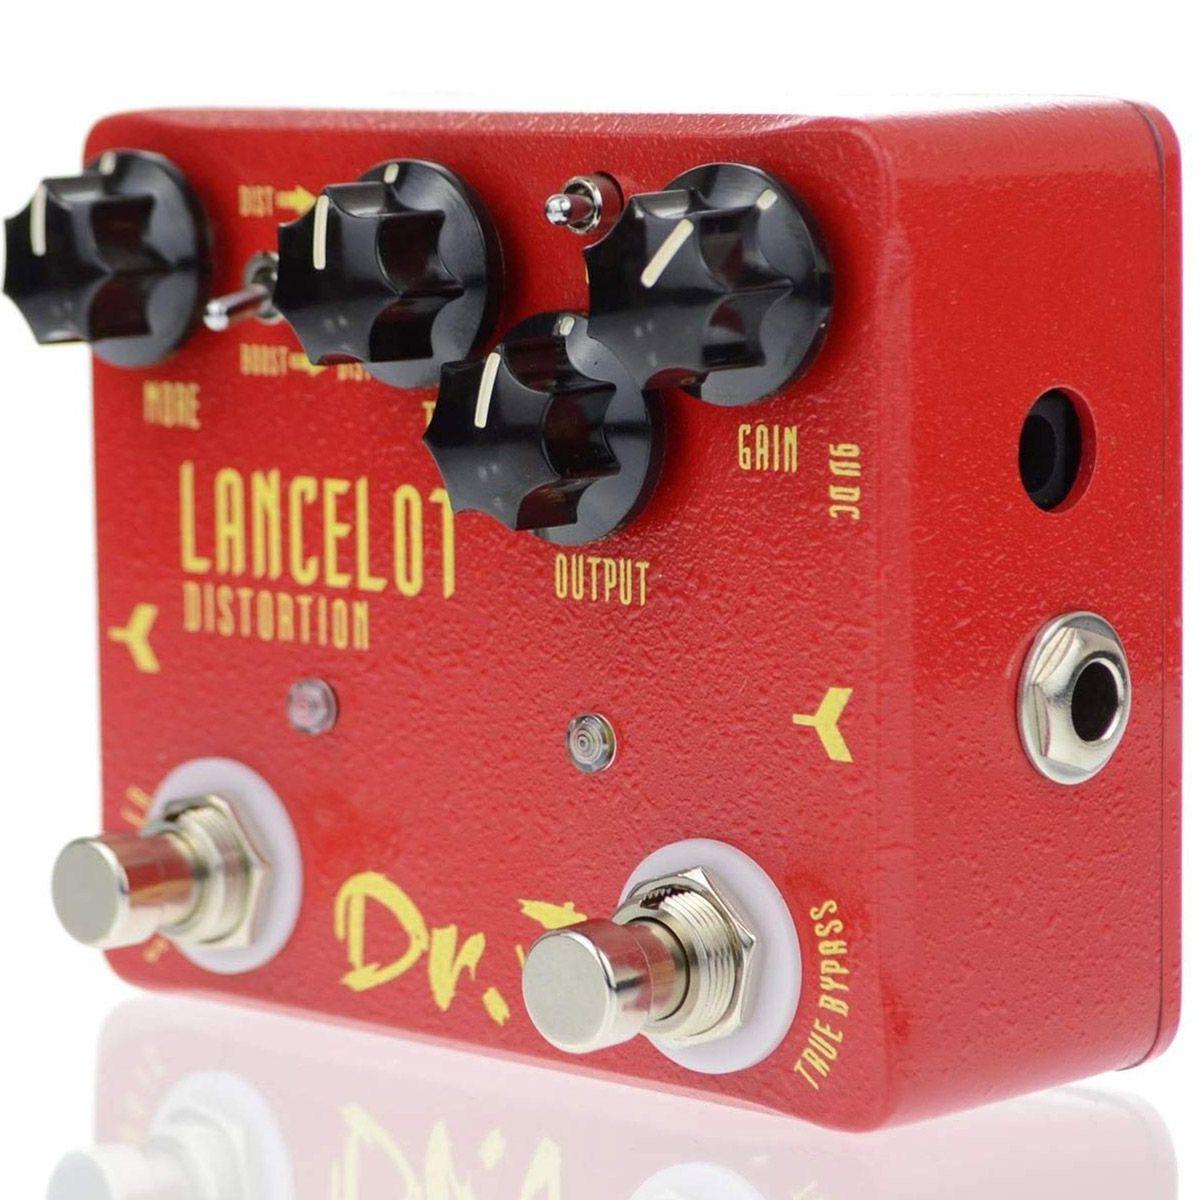 Pedal de Efeitos Joyo Lancelot D-59 Distortion para Guitarra